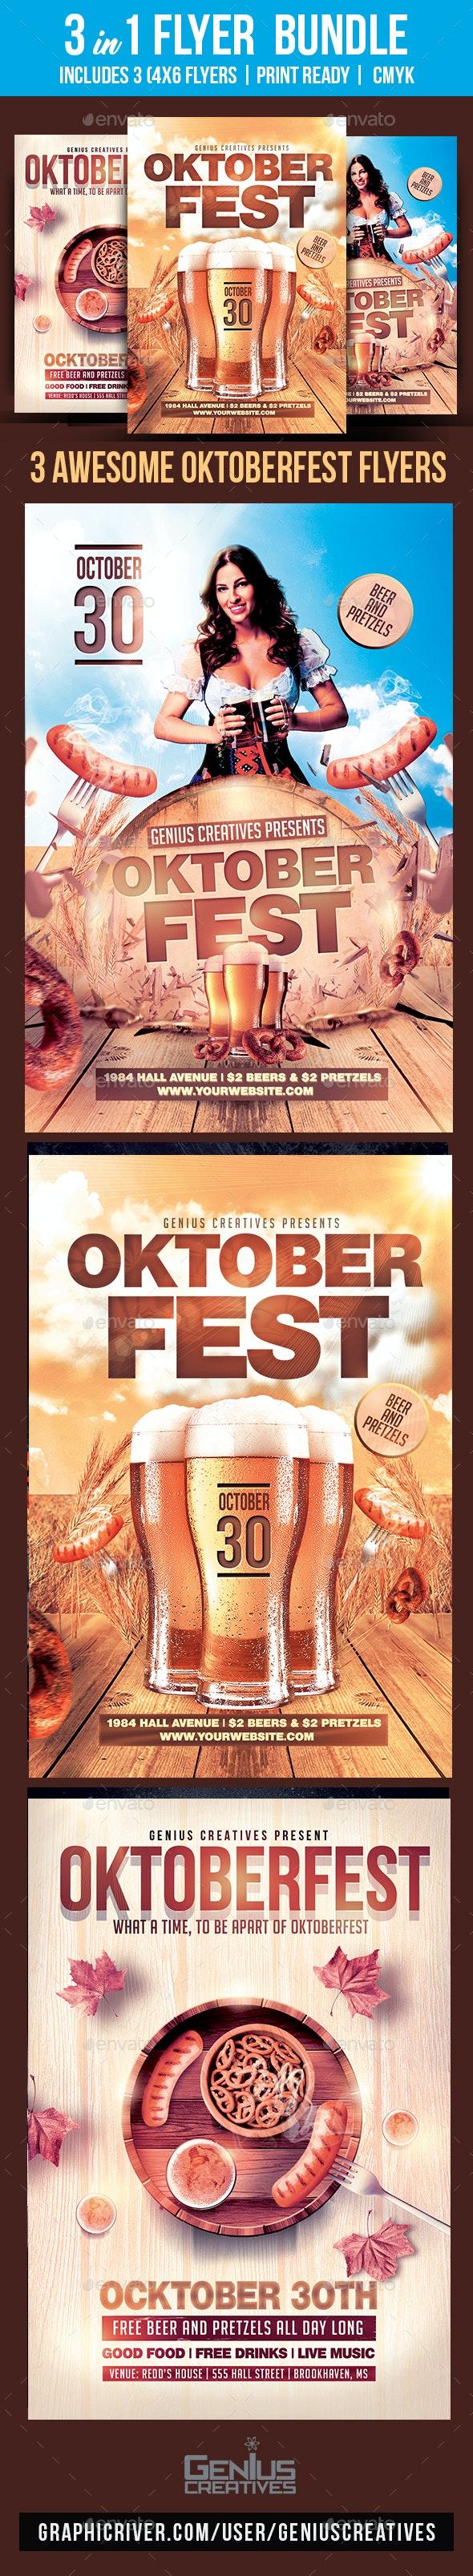 Oktoberfest Flyer Bundle - Holiday Greeting Cards